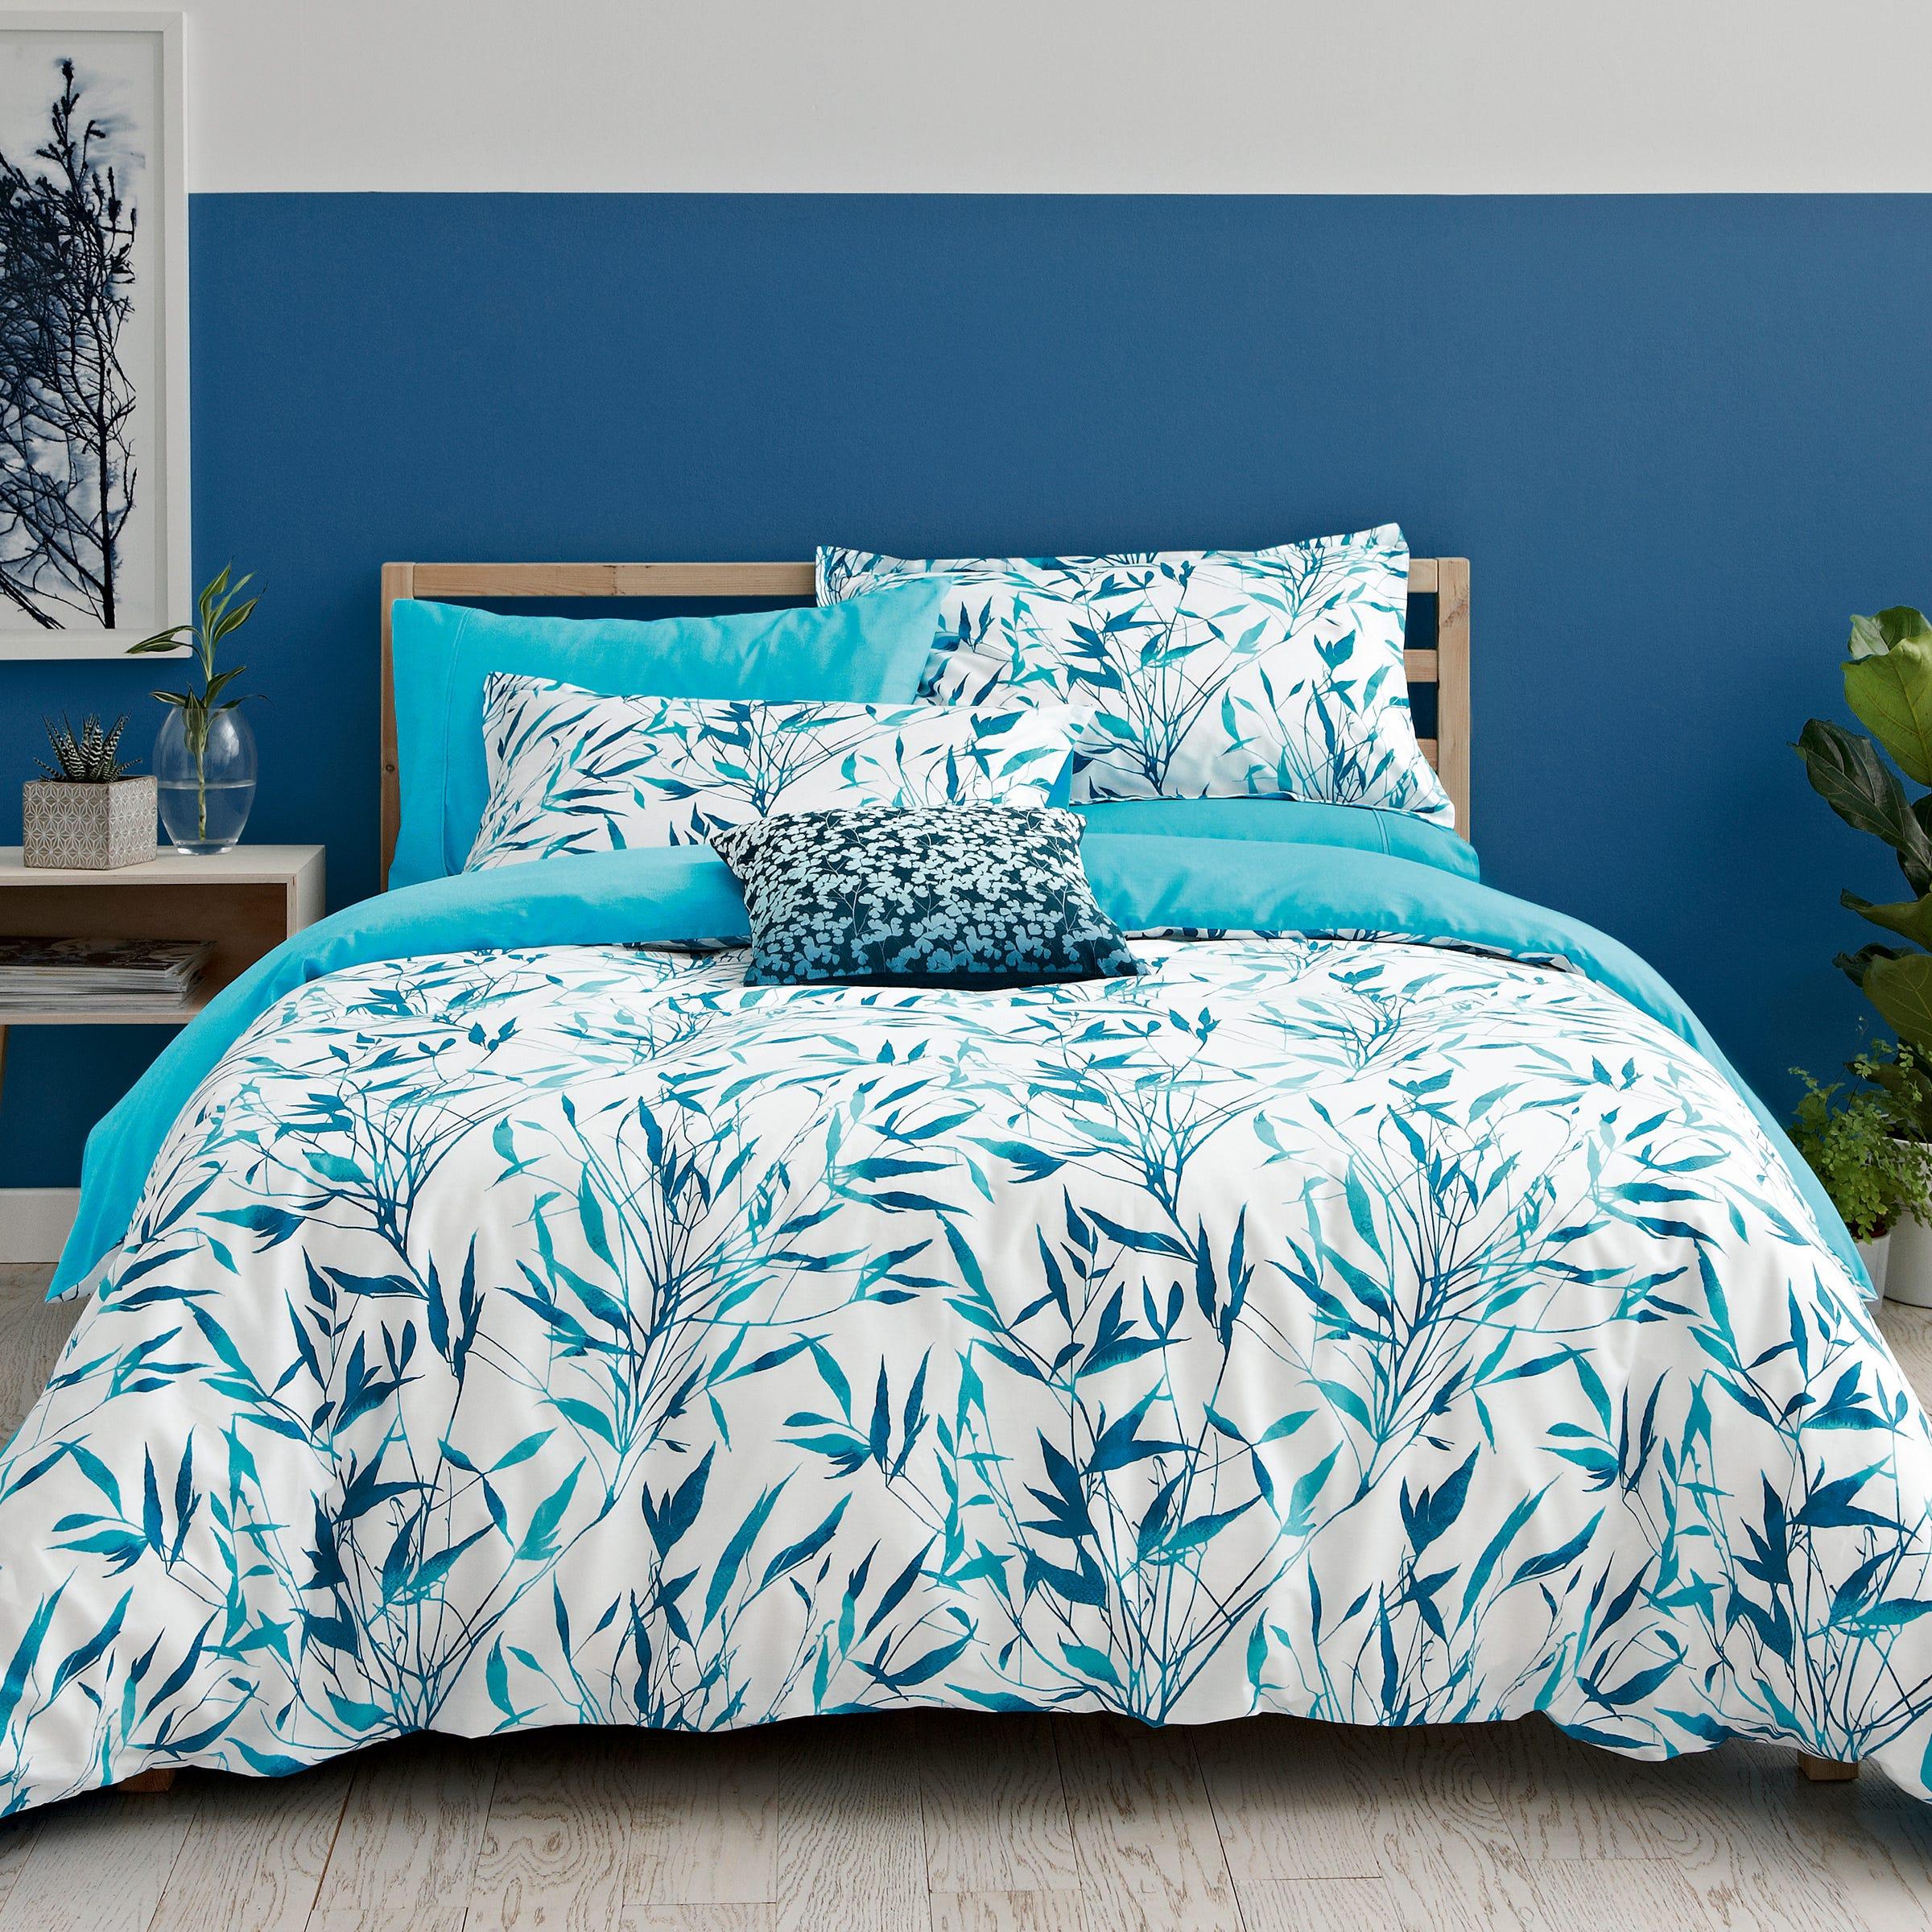 Clarissa Hulse Bedding Bamboo Single Duvet Cover Turquoise